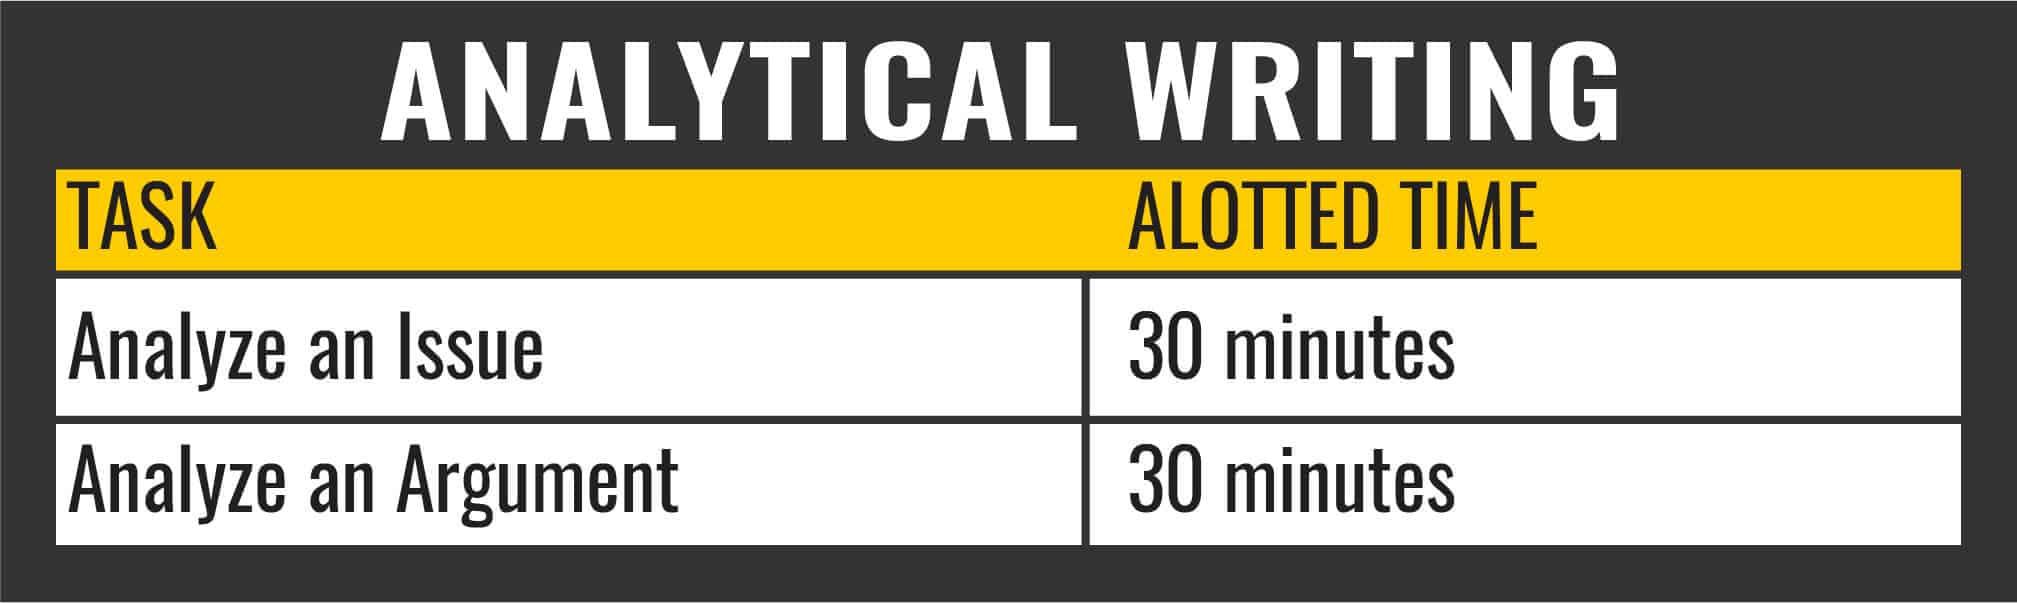 Analytical Writing